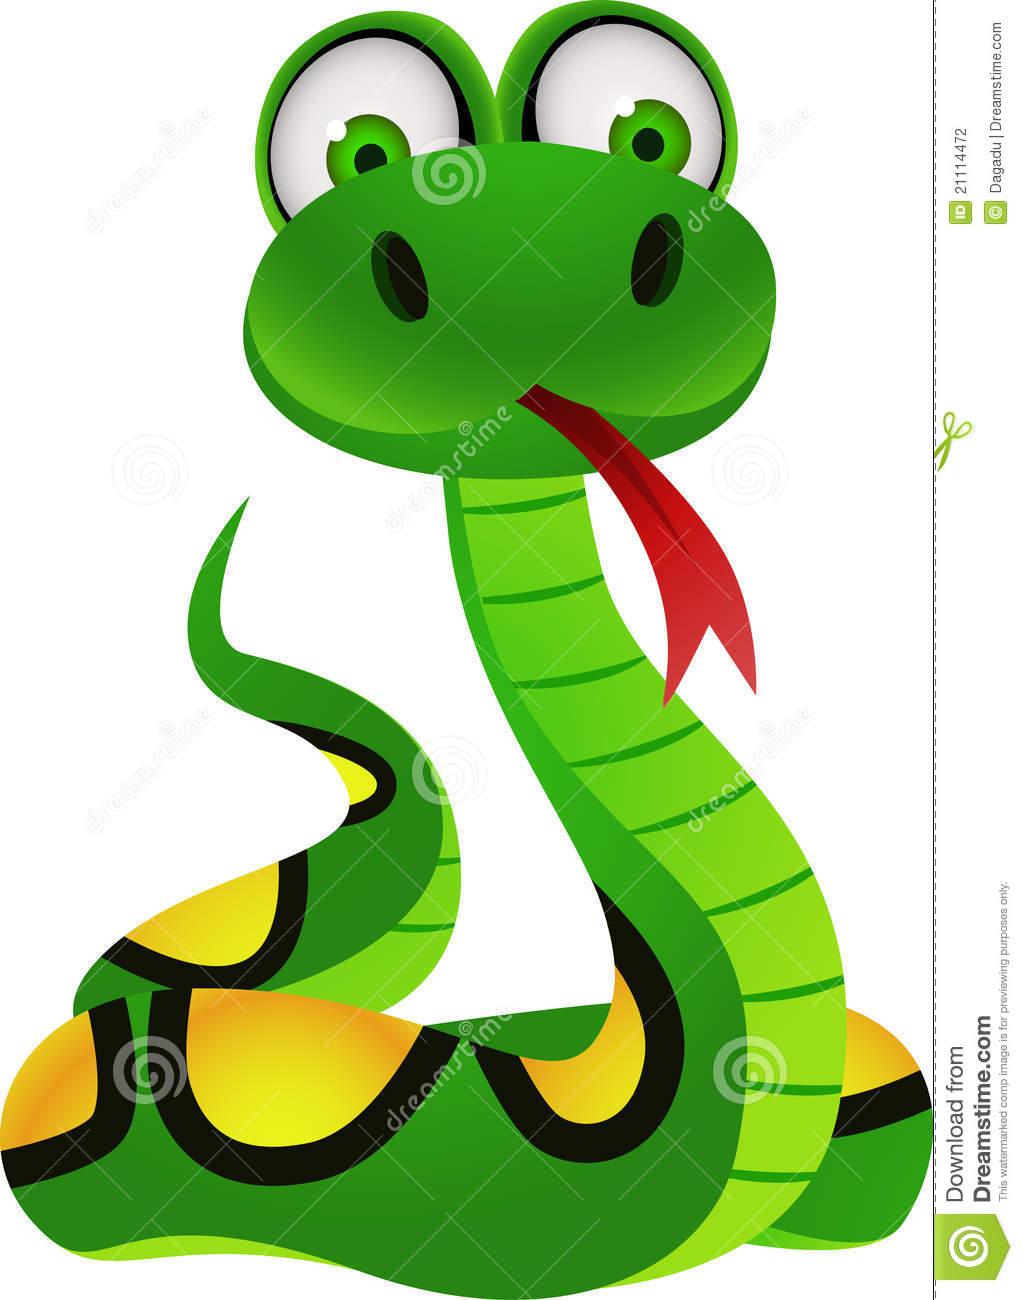 Serpent clipart halloween Critters Search animados la de